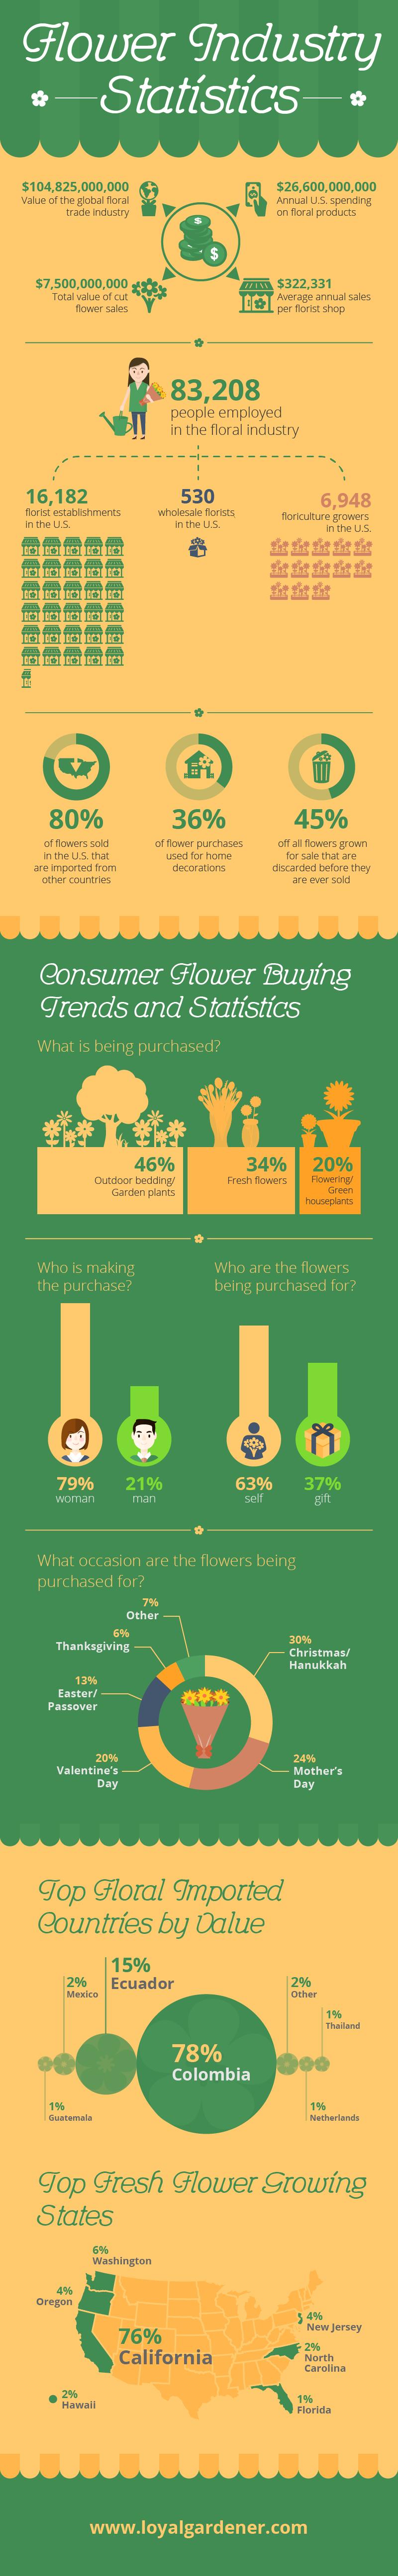 Flower Industry Statistics Infographic